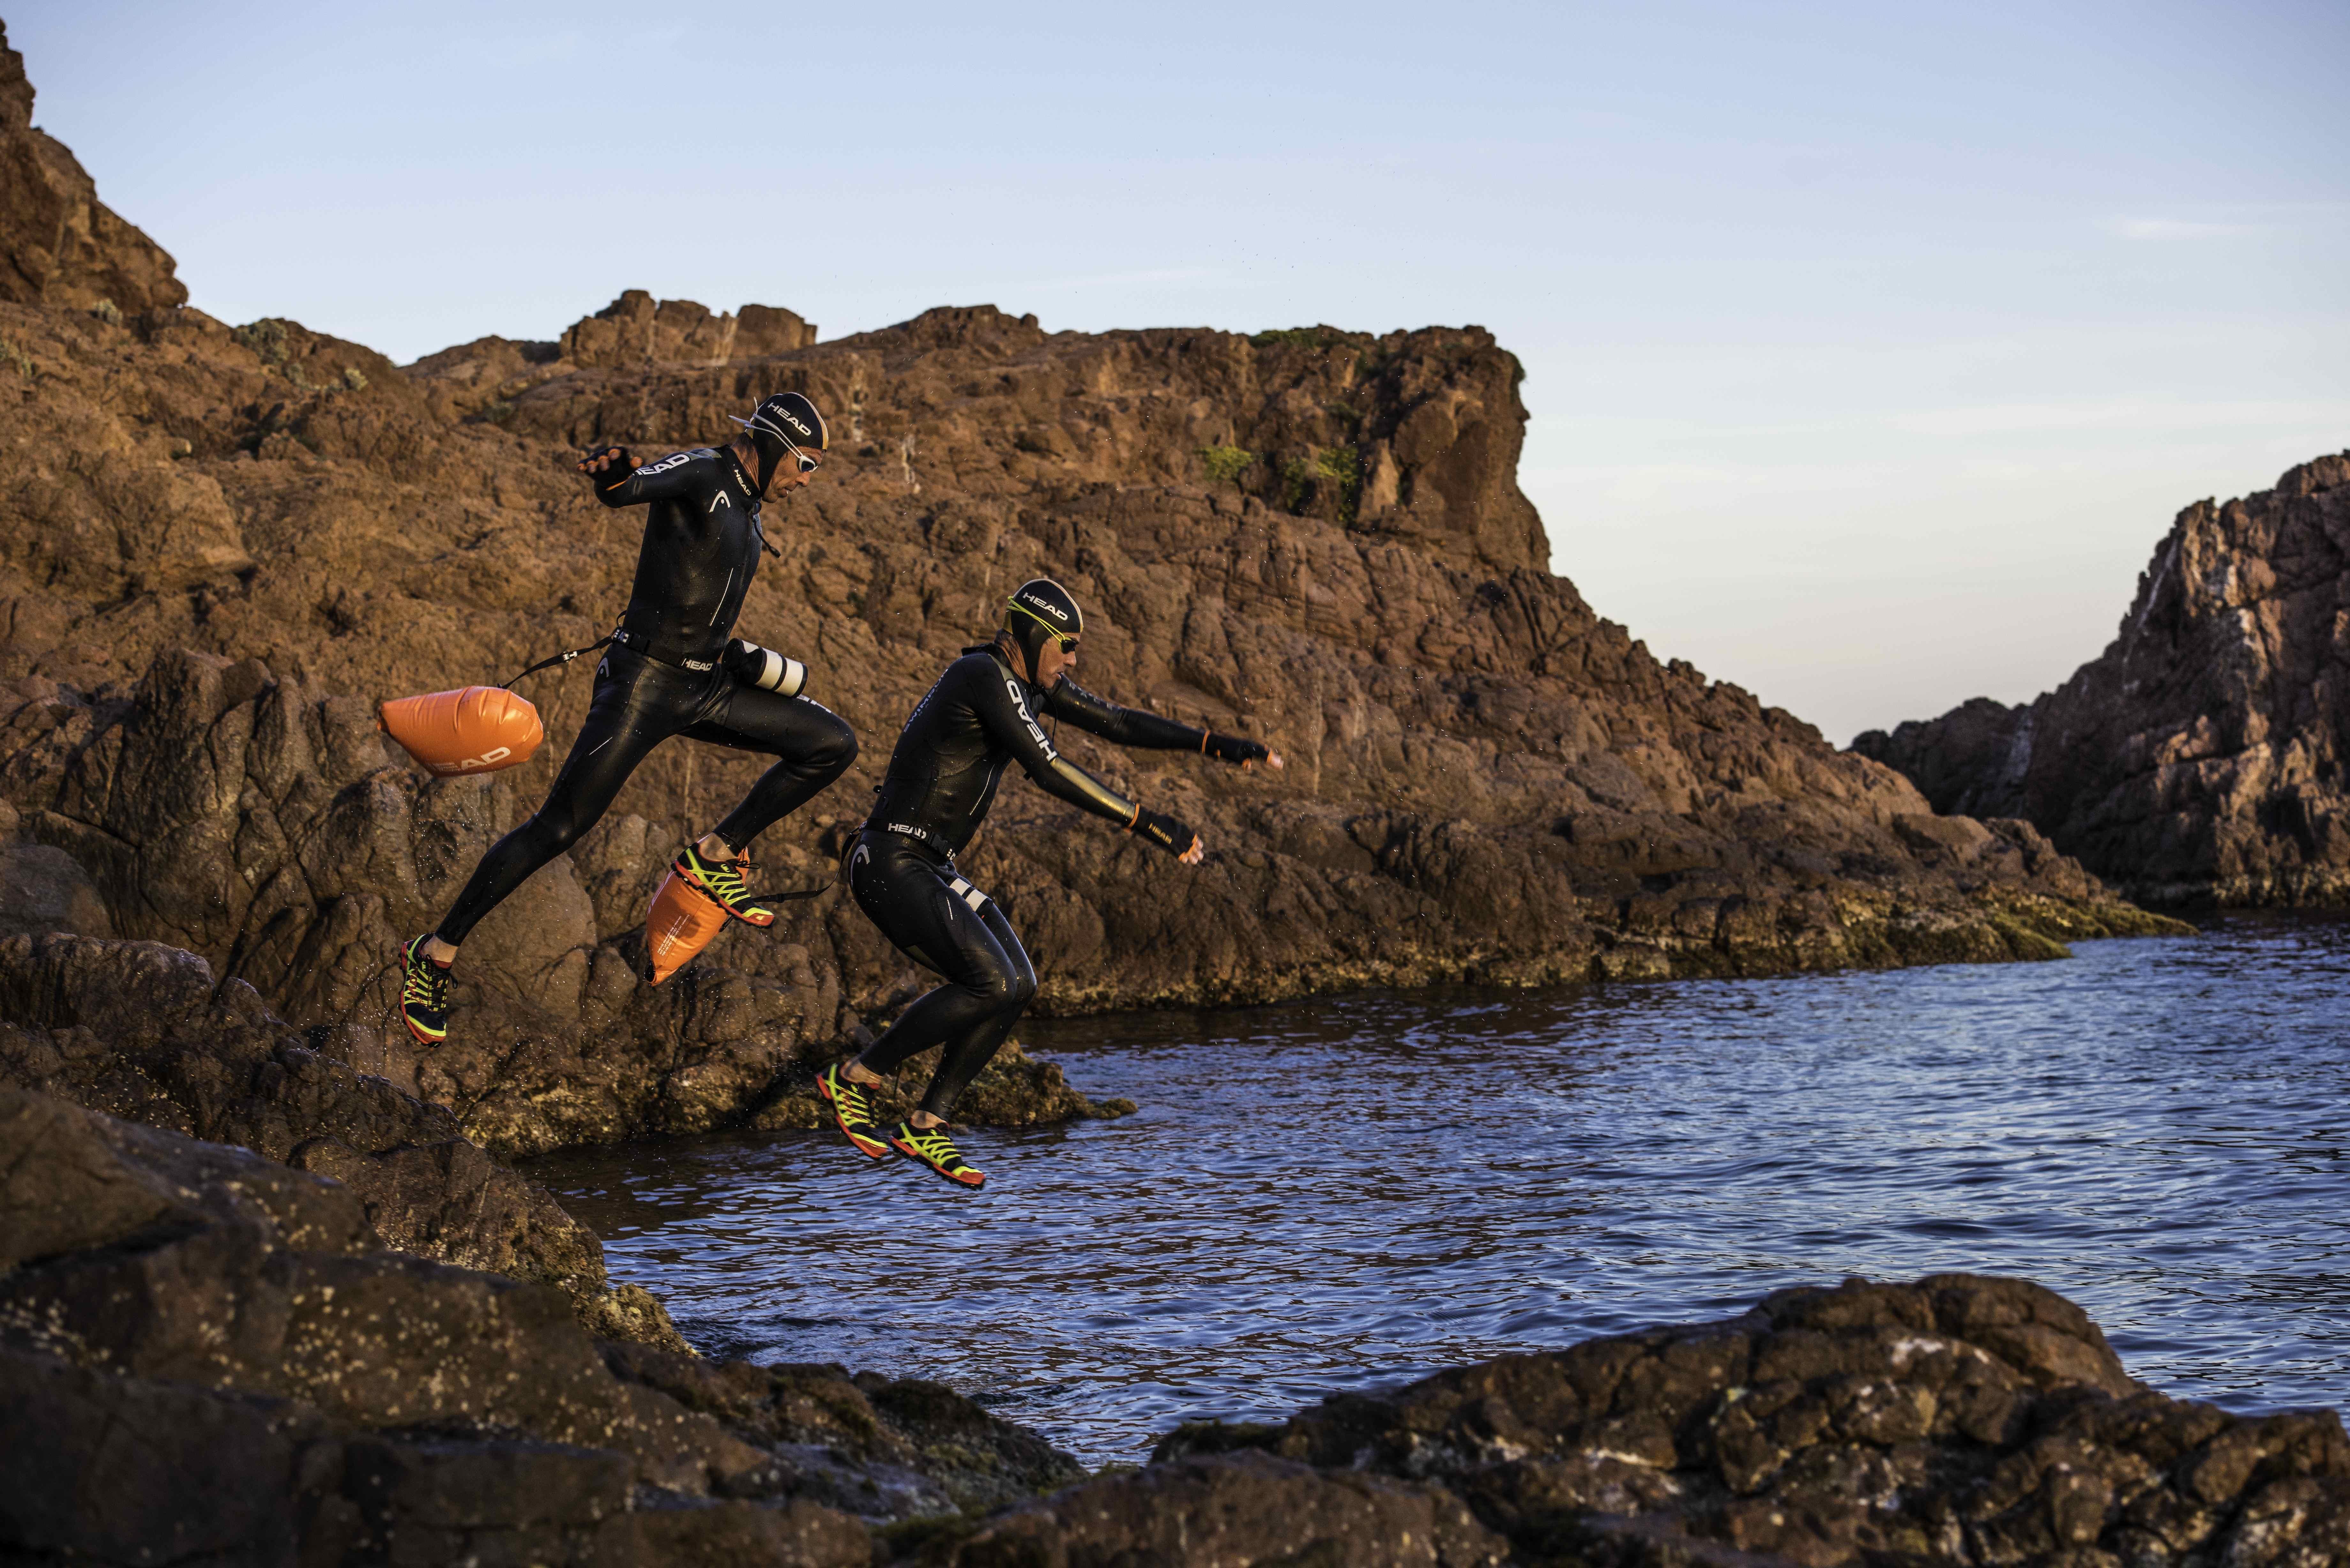 Schauinsland Mallorca Swimrun, la carrera más innovadora